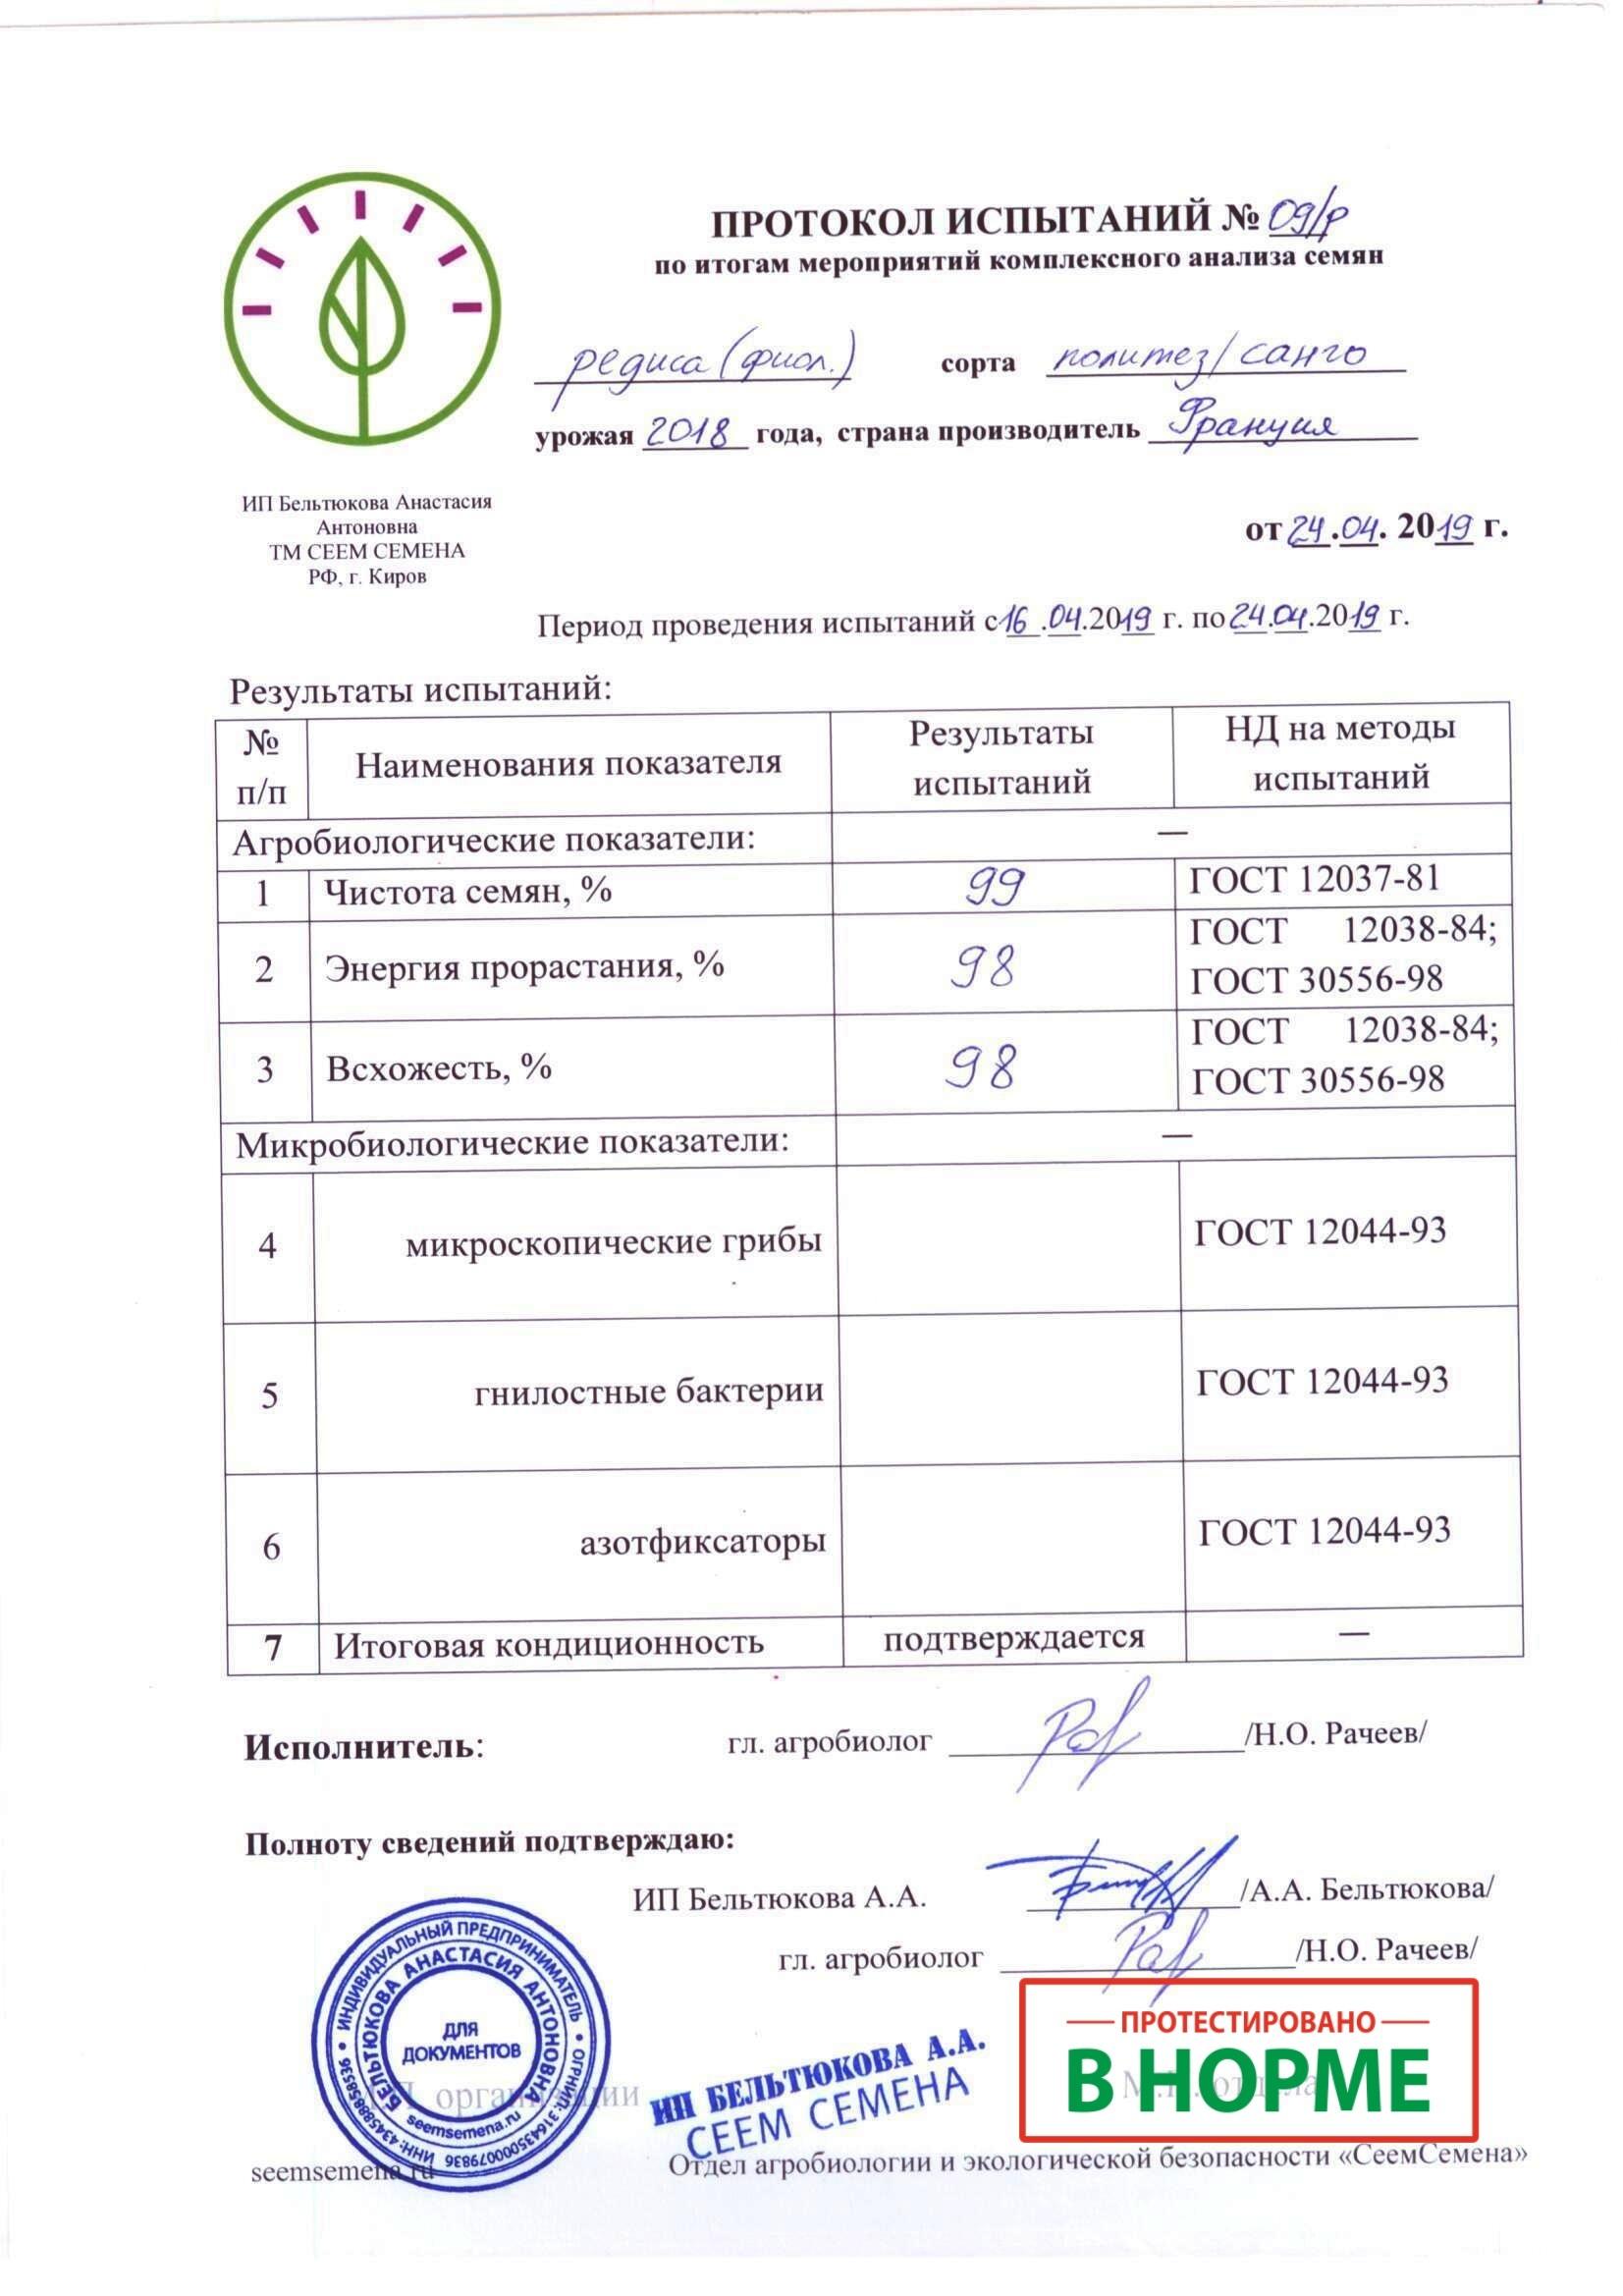 ПРОТОКОЛ ИСПЫТАНИЙ СЕМЯН РЕДИСА САНГО №09/р